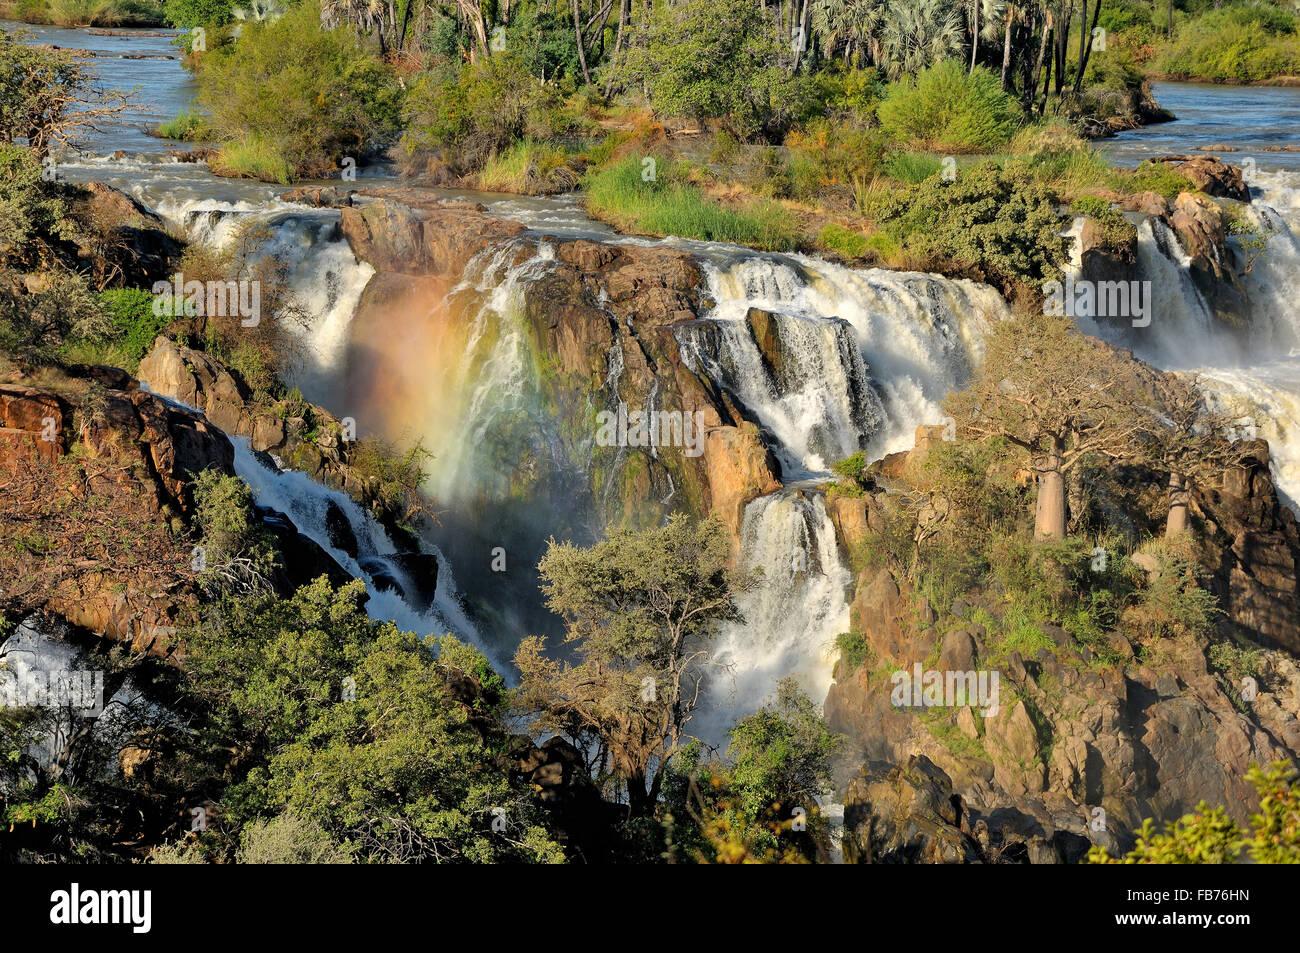 Epupa waterfall, Namibia - Stock Image